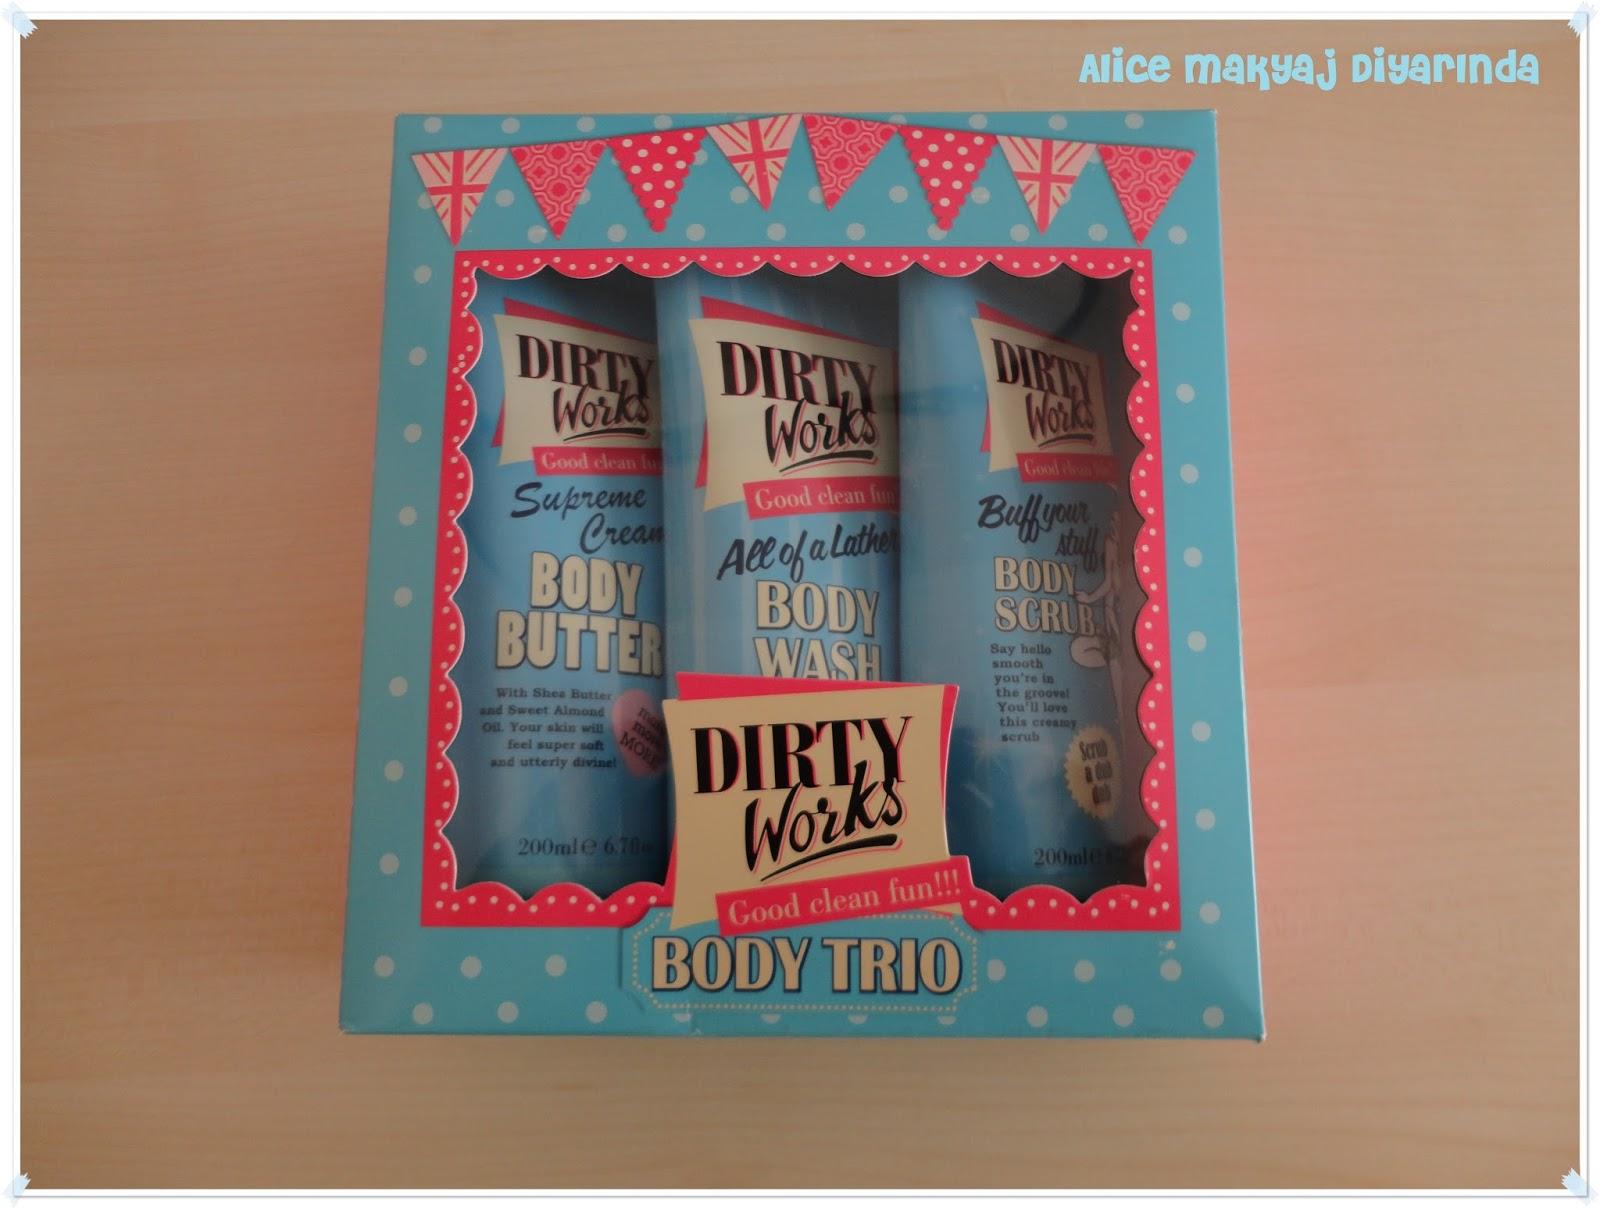 Dirty Works Body Trio- Üçlü Vücut Bakım Seti